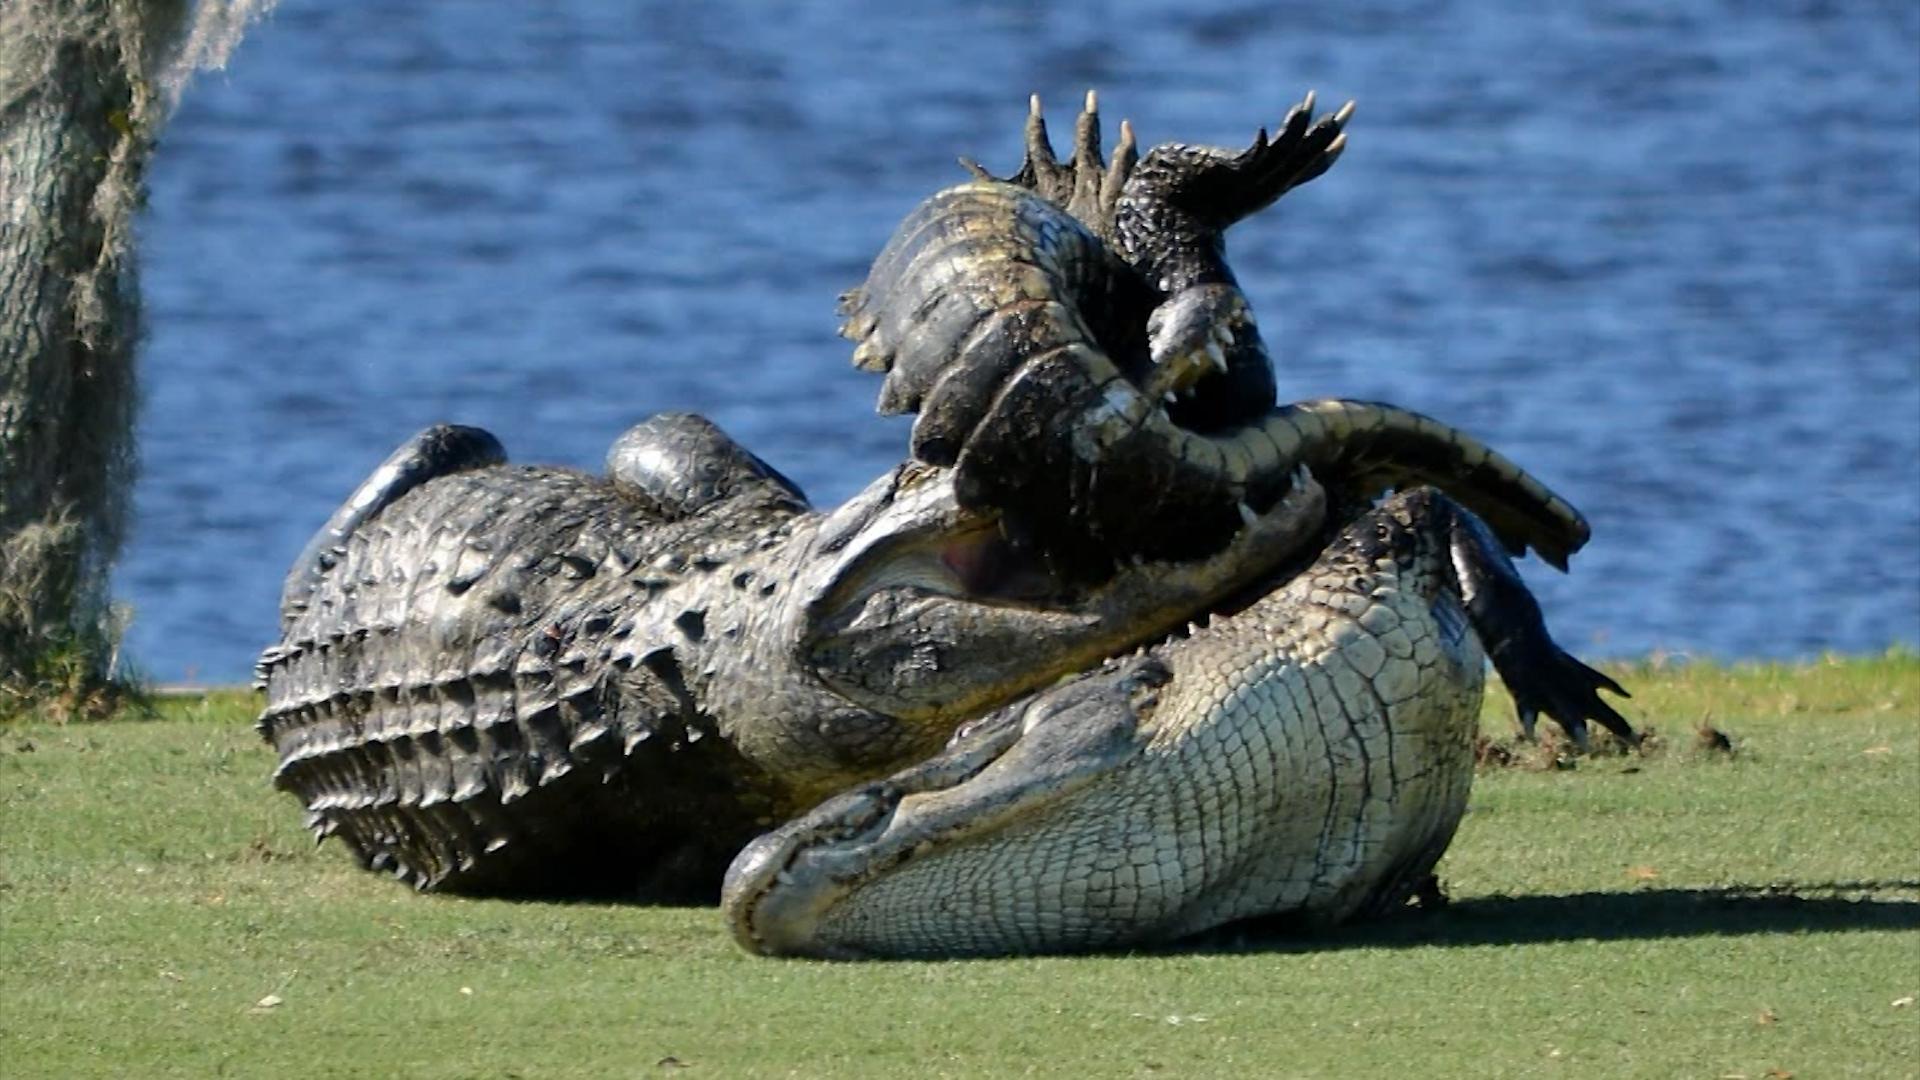 10 foot gators seen fighting on golf course cnn video